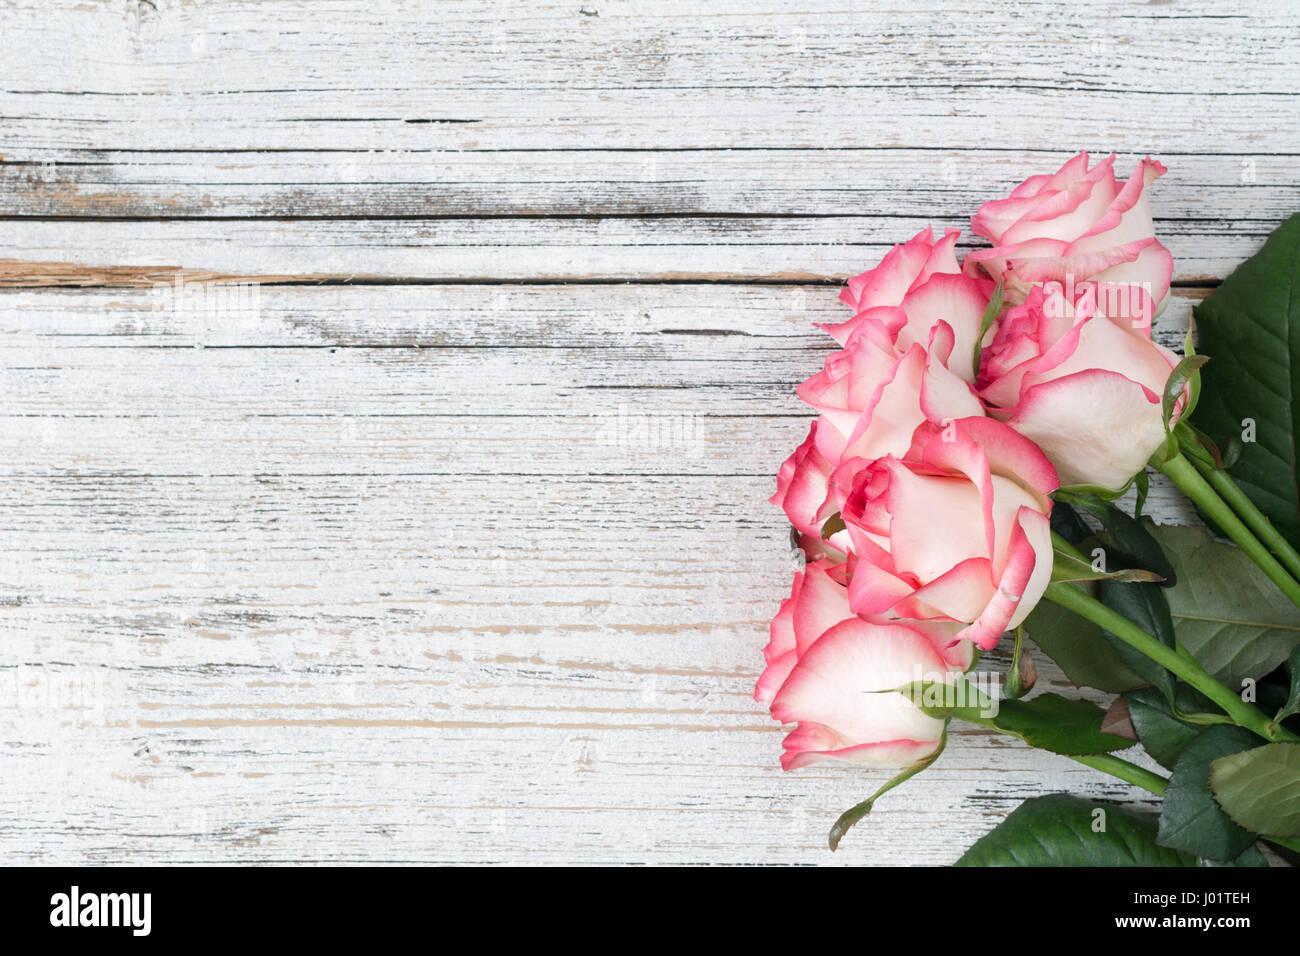 rosas rosas sobre fondo blanco de madera vintage vista superior